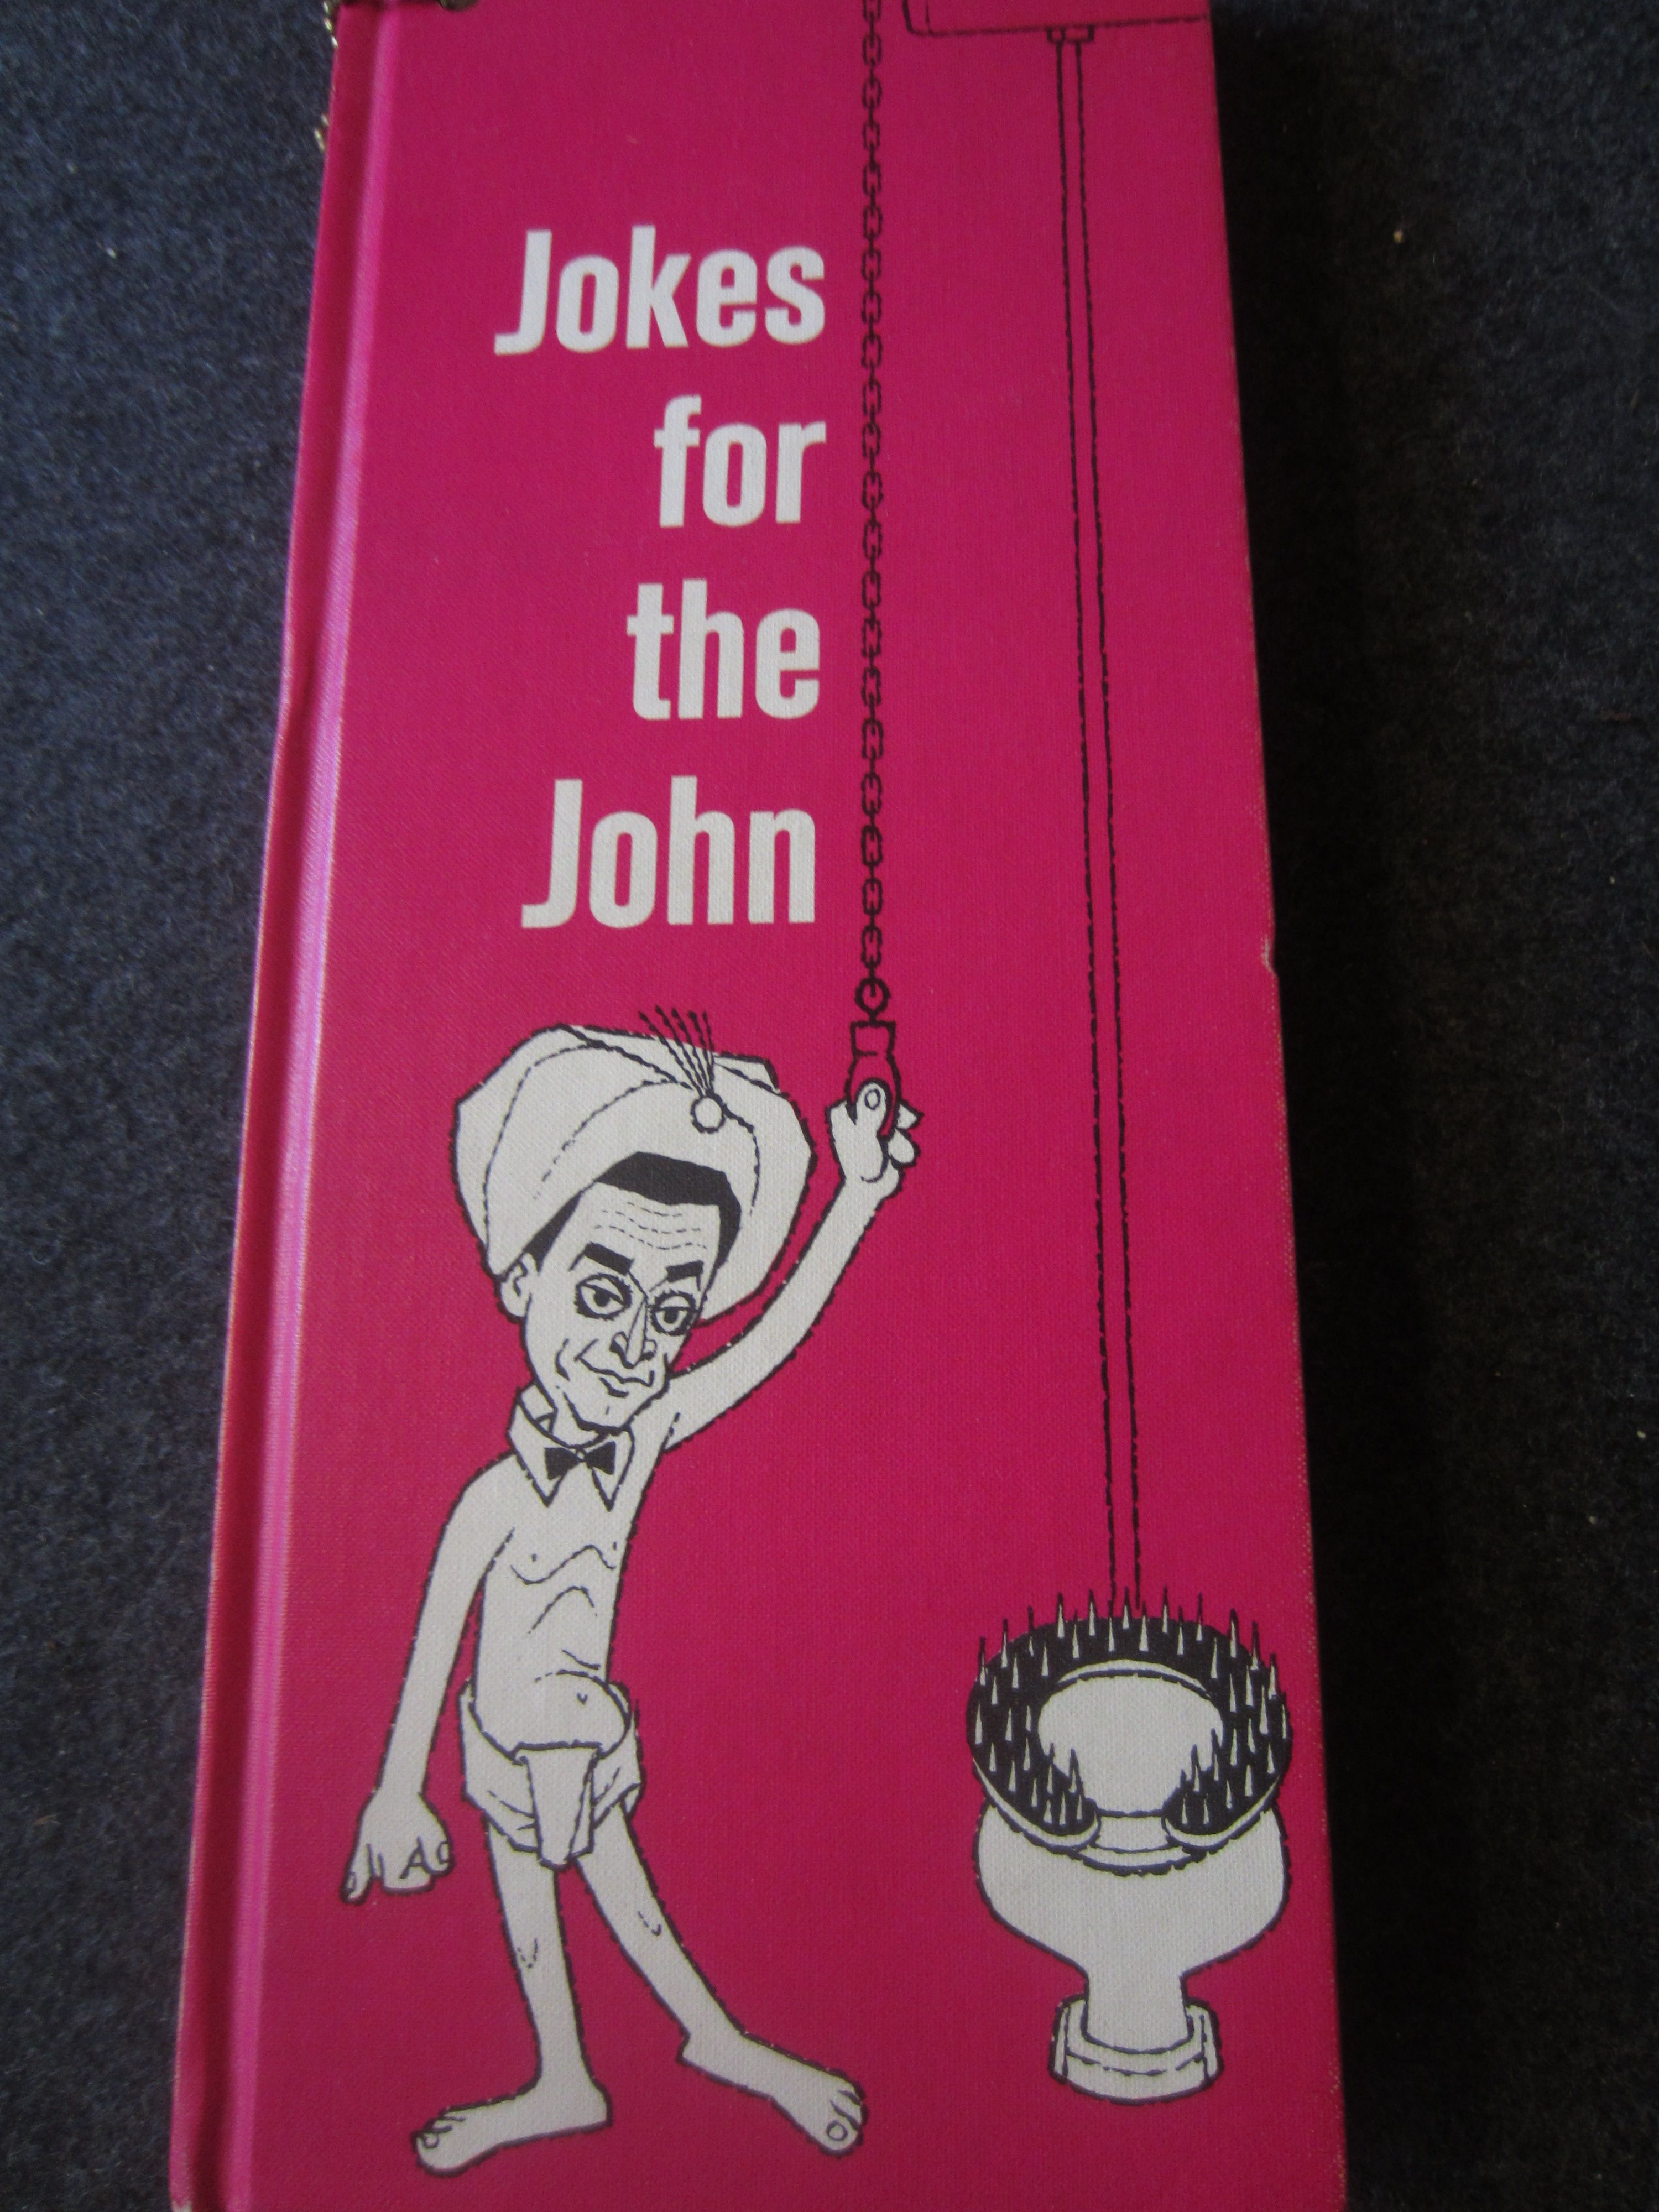 1961 Book Jokes For The John Adult Funny Jokes Kitschy